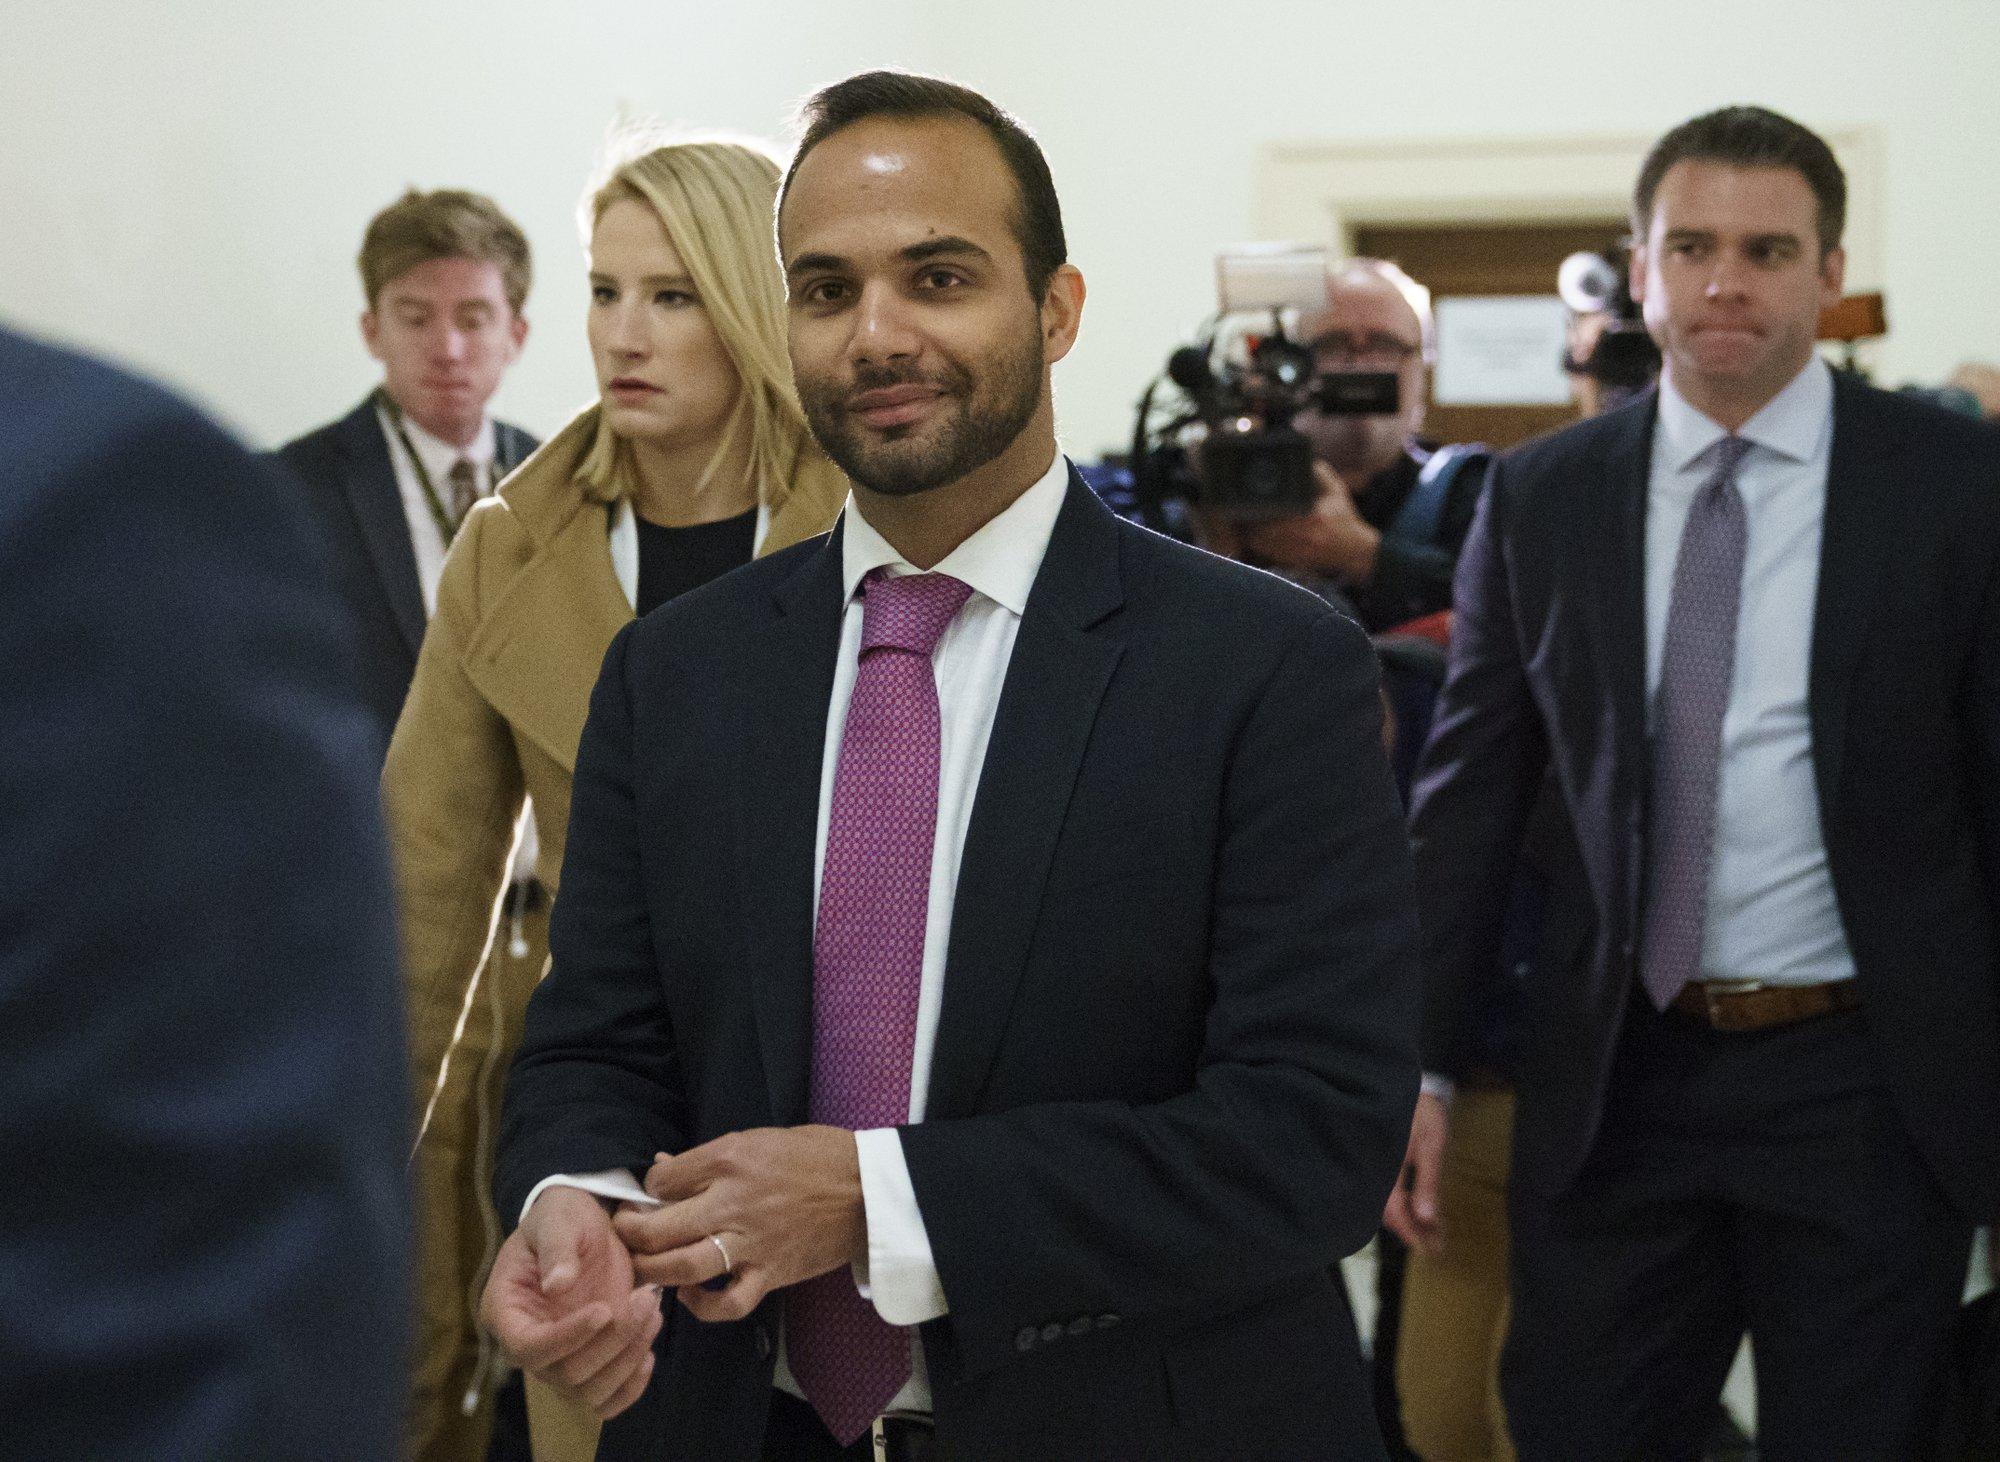 US judge orders ex-Trump campaign adviser Papadopoulos to report to jail